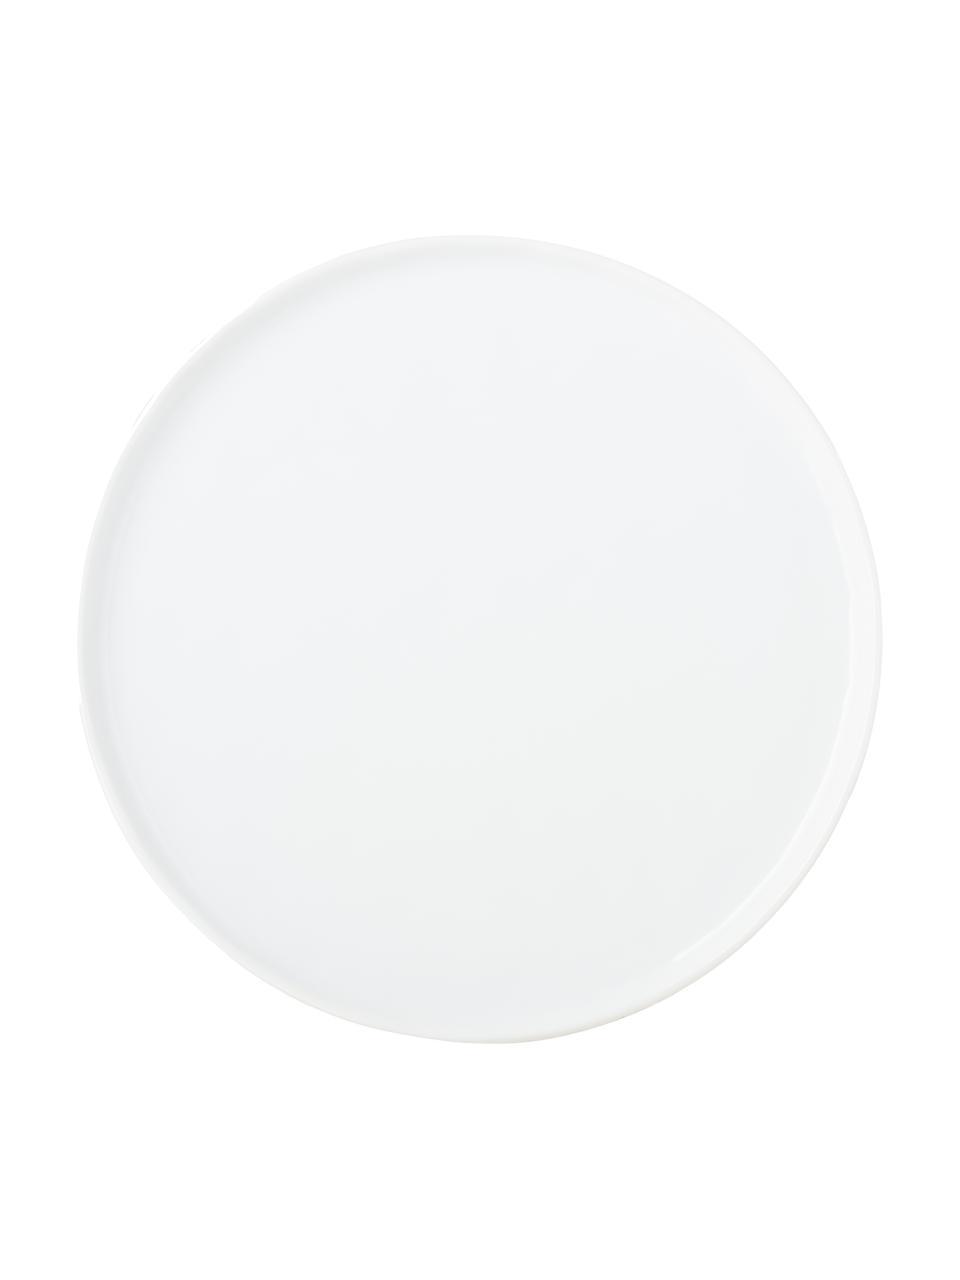 Dinerborden Porcelino, 4 stuks, Porselein, Wit, Ø 27 cm